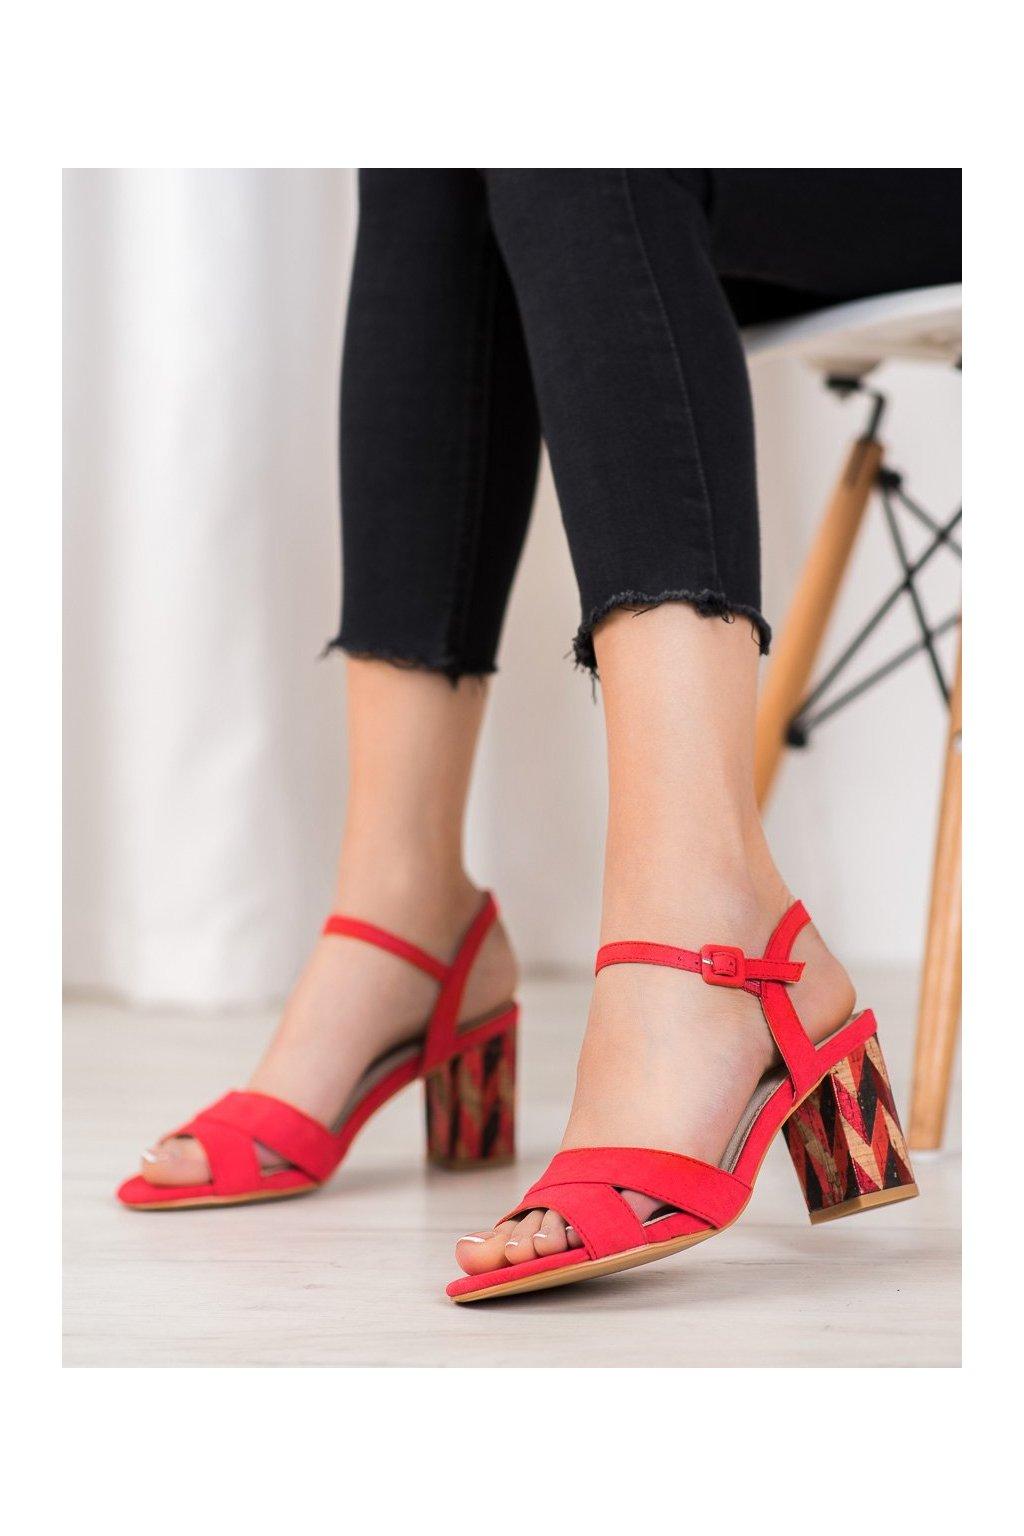 Červené sandále Filippo kod DS775/19R